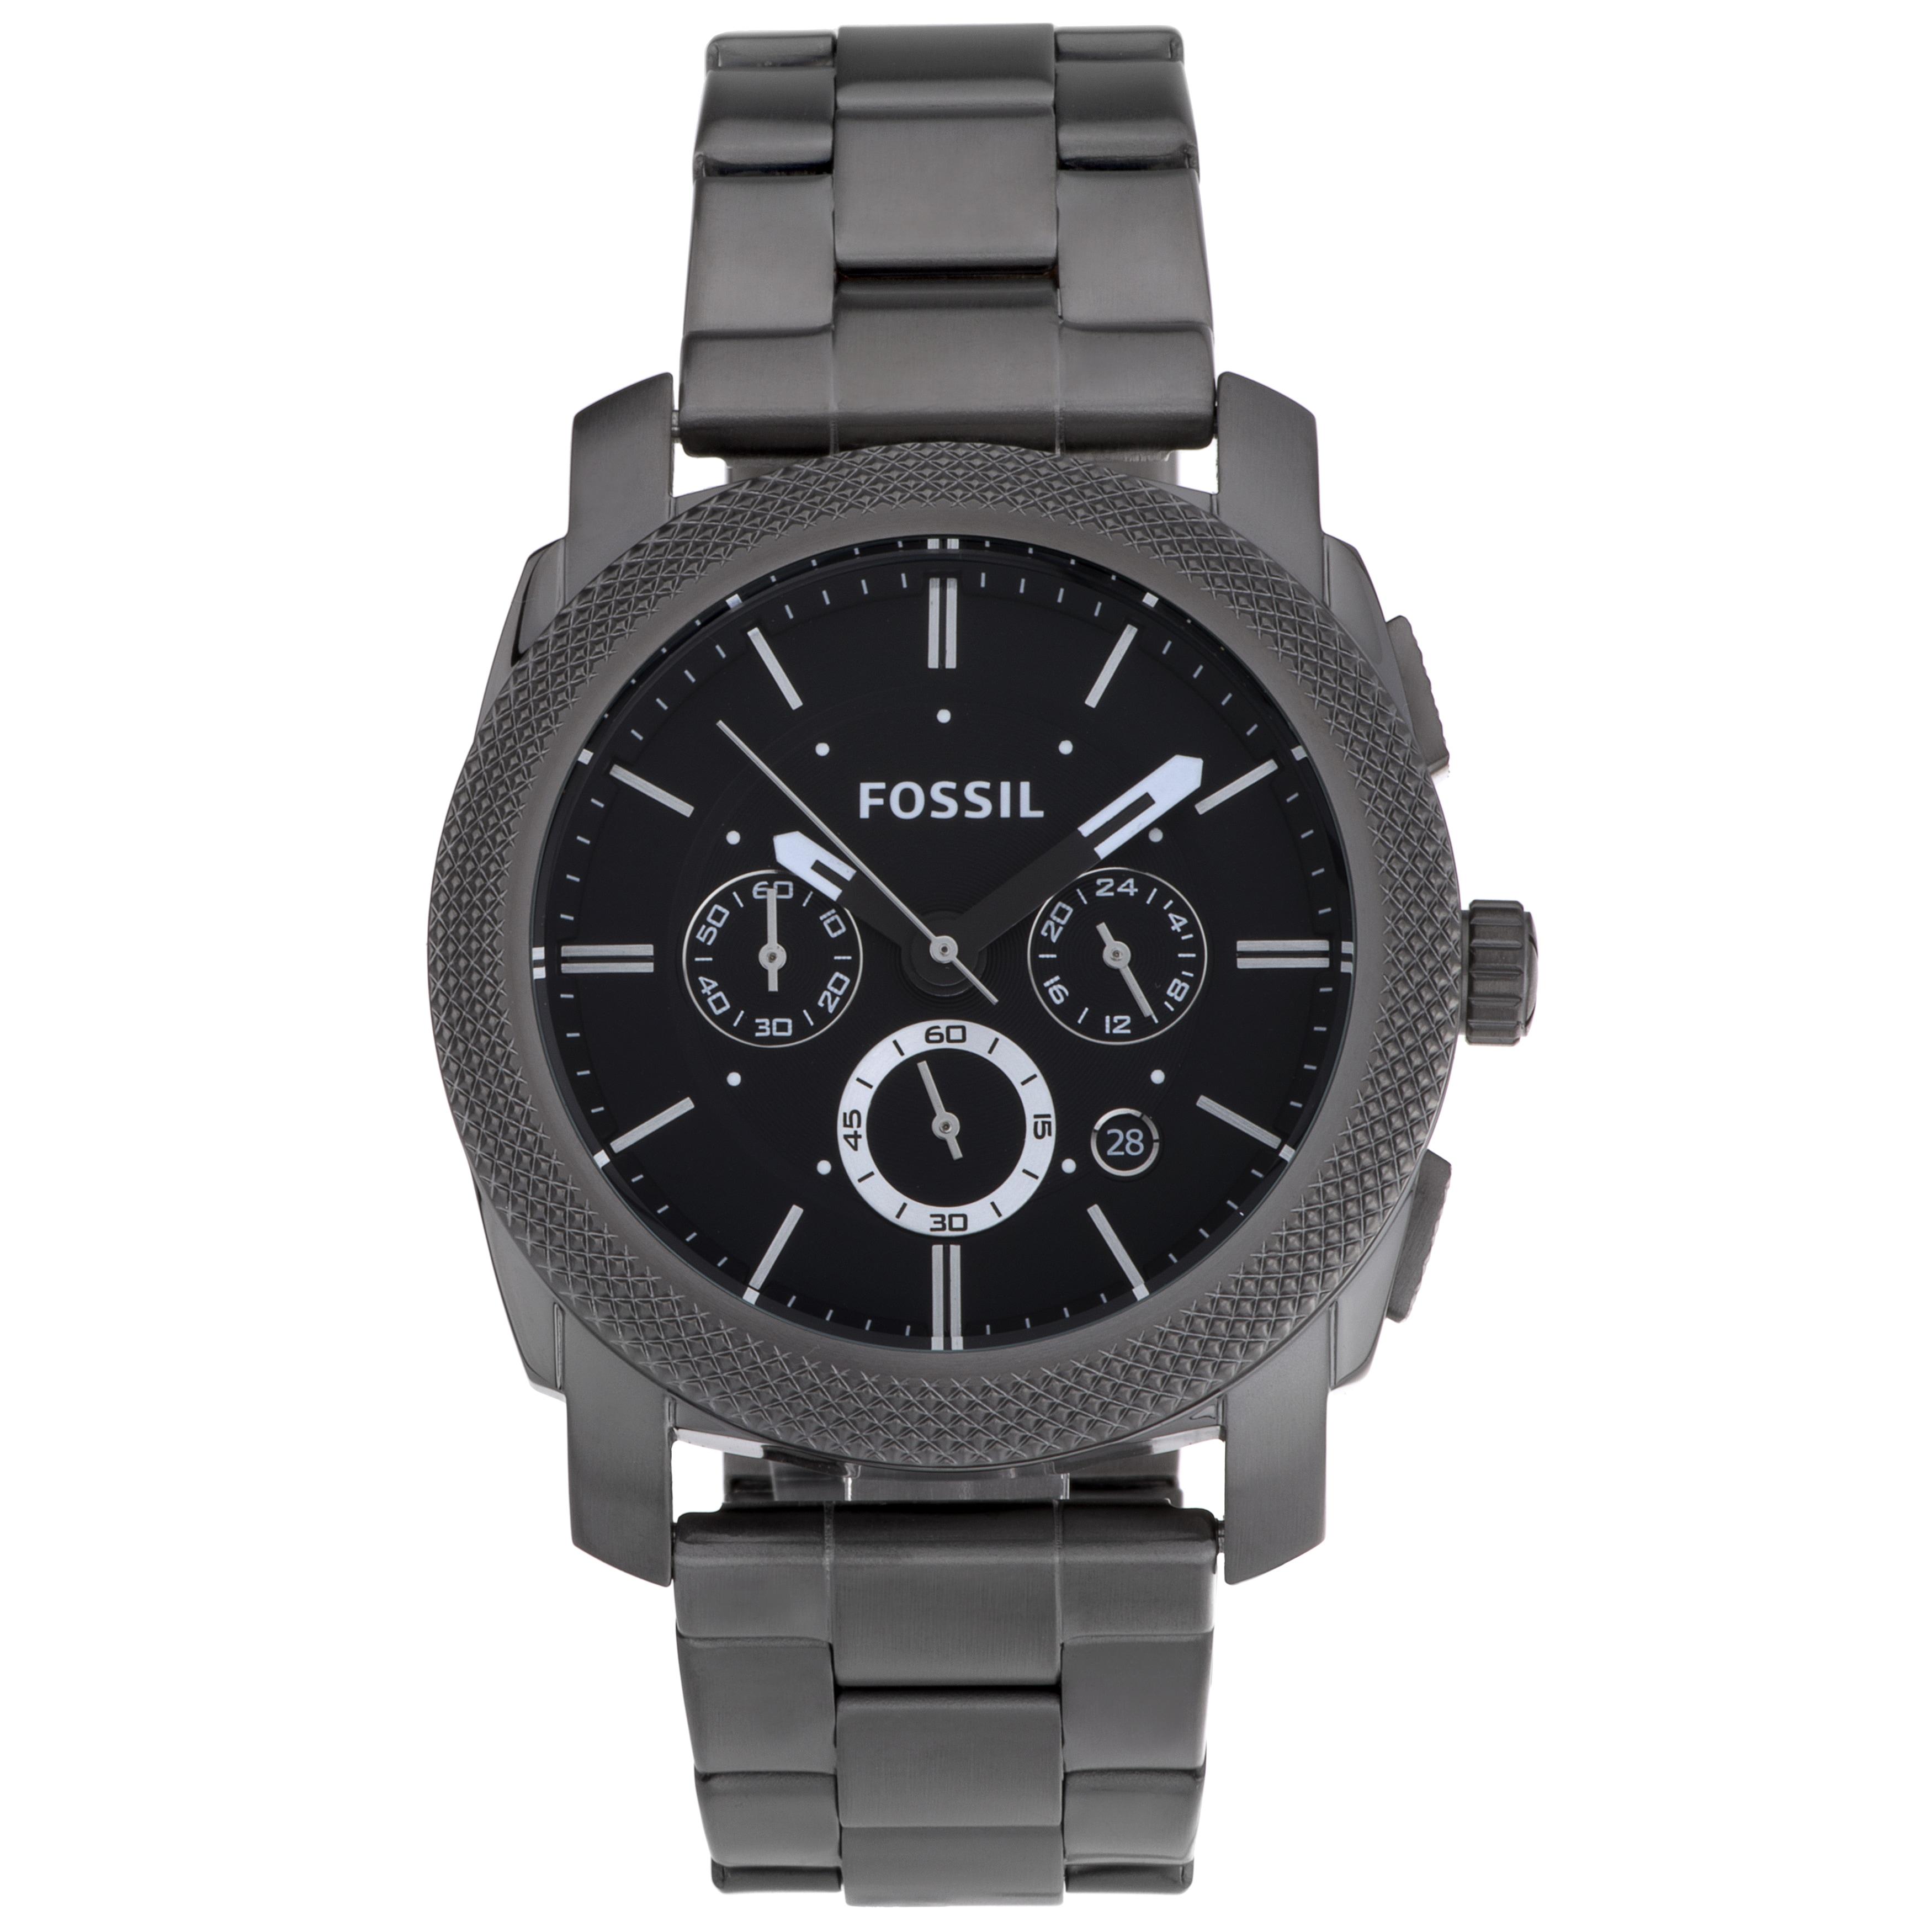 Fossil Men's FS4662 Machine Stainless Steel Watch, Black,...